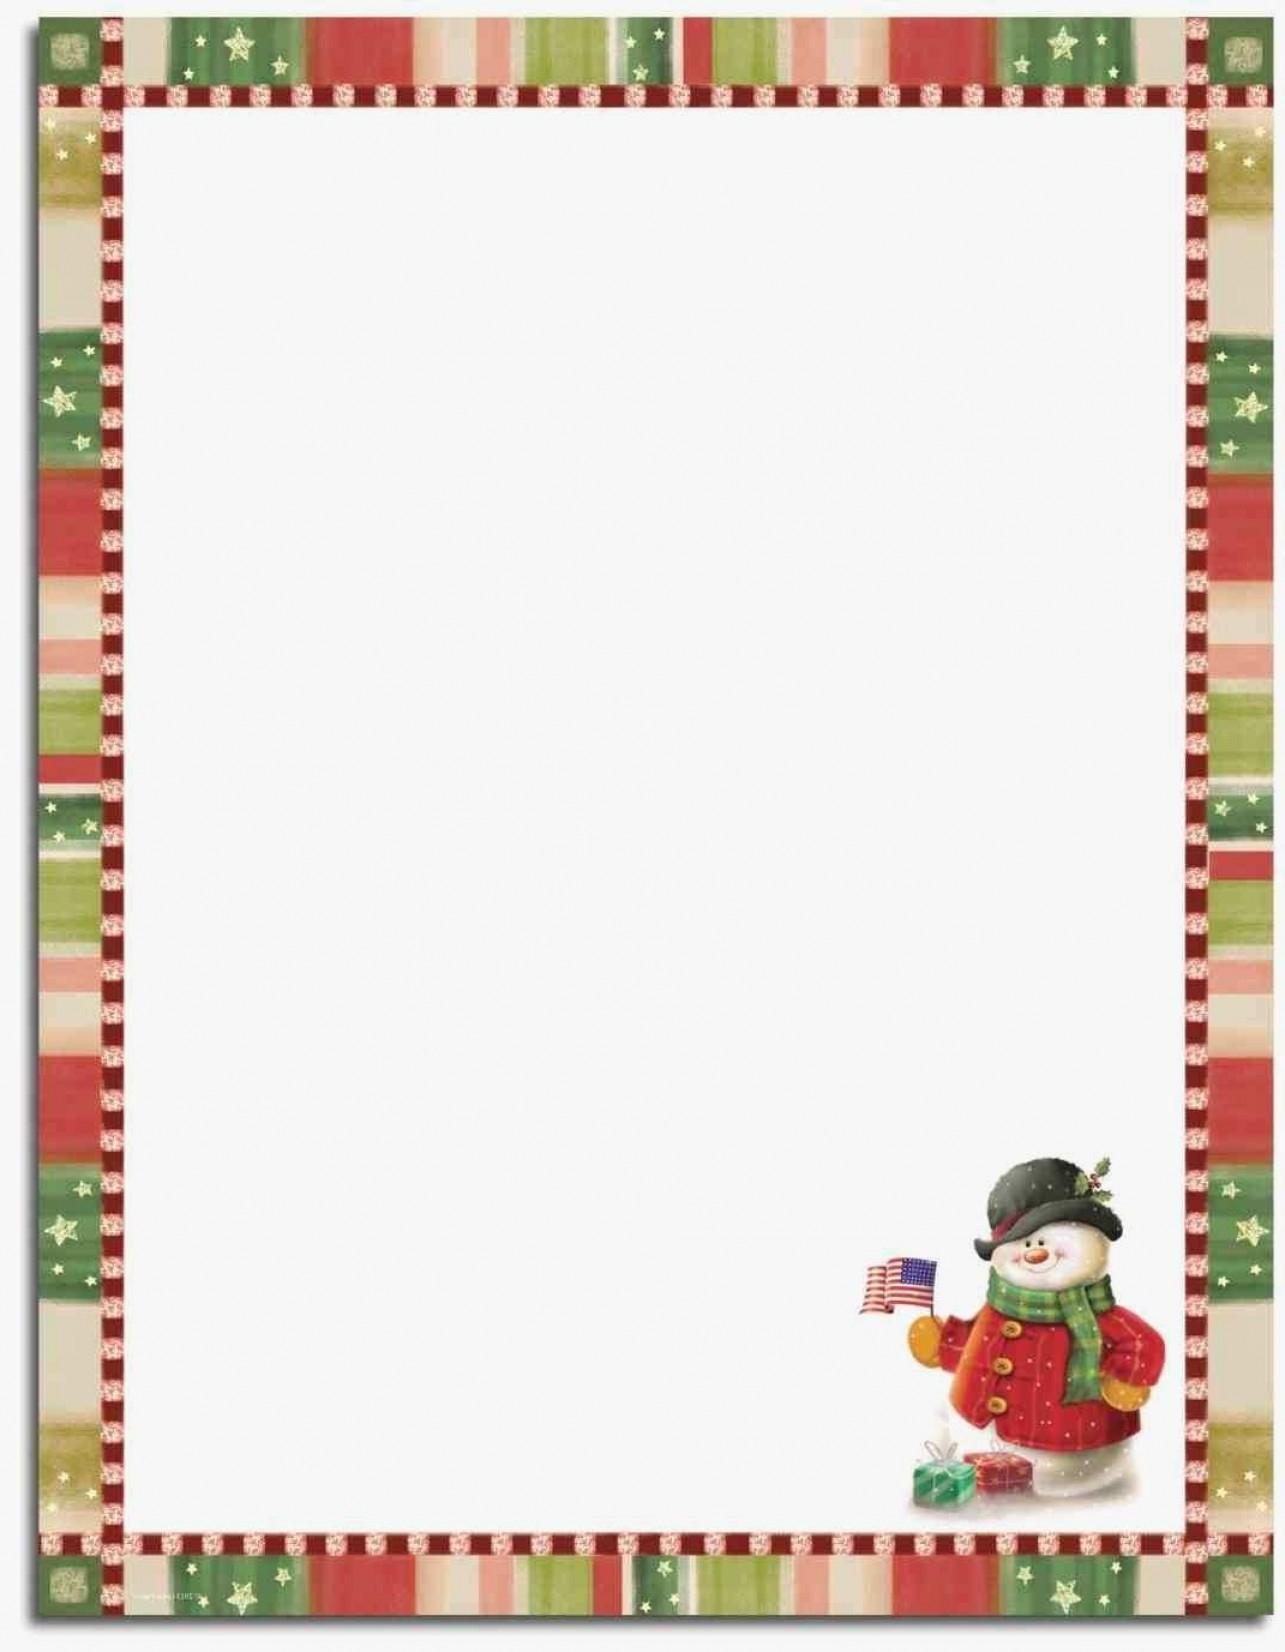 Free Holiday Stationery Templates Beautiful 76 Free Christmas - Free Printable Christmas Stationery Paper